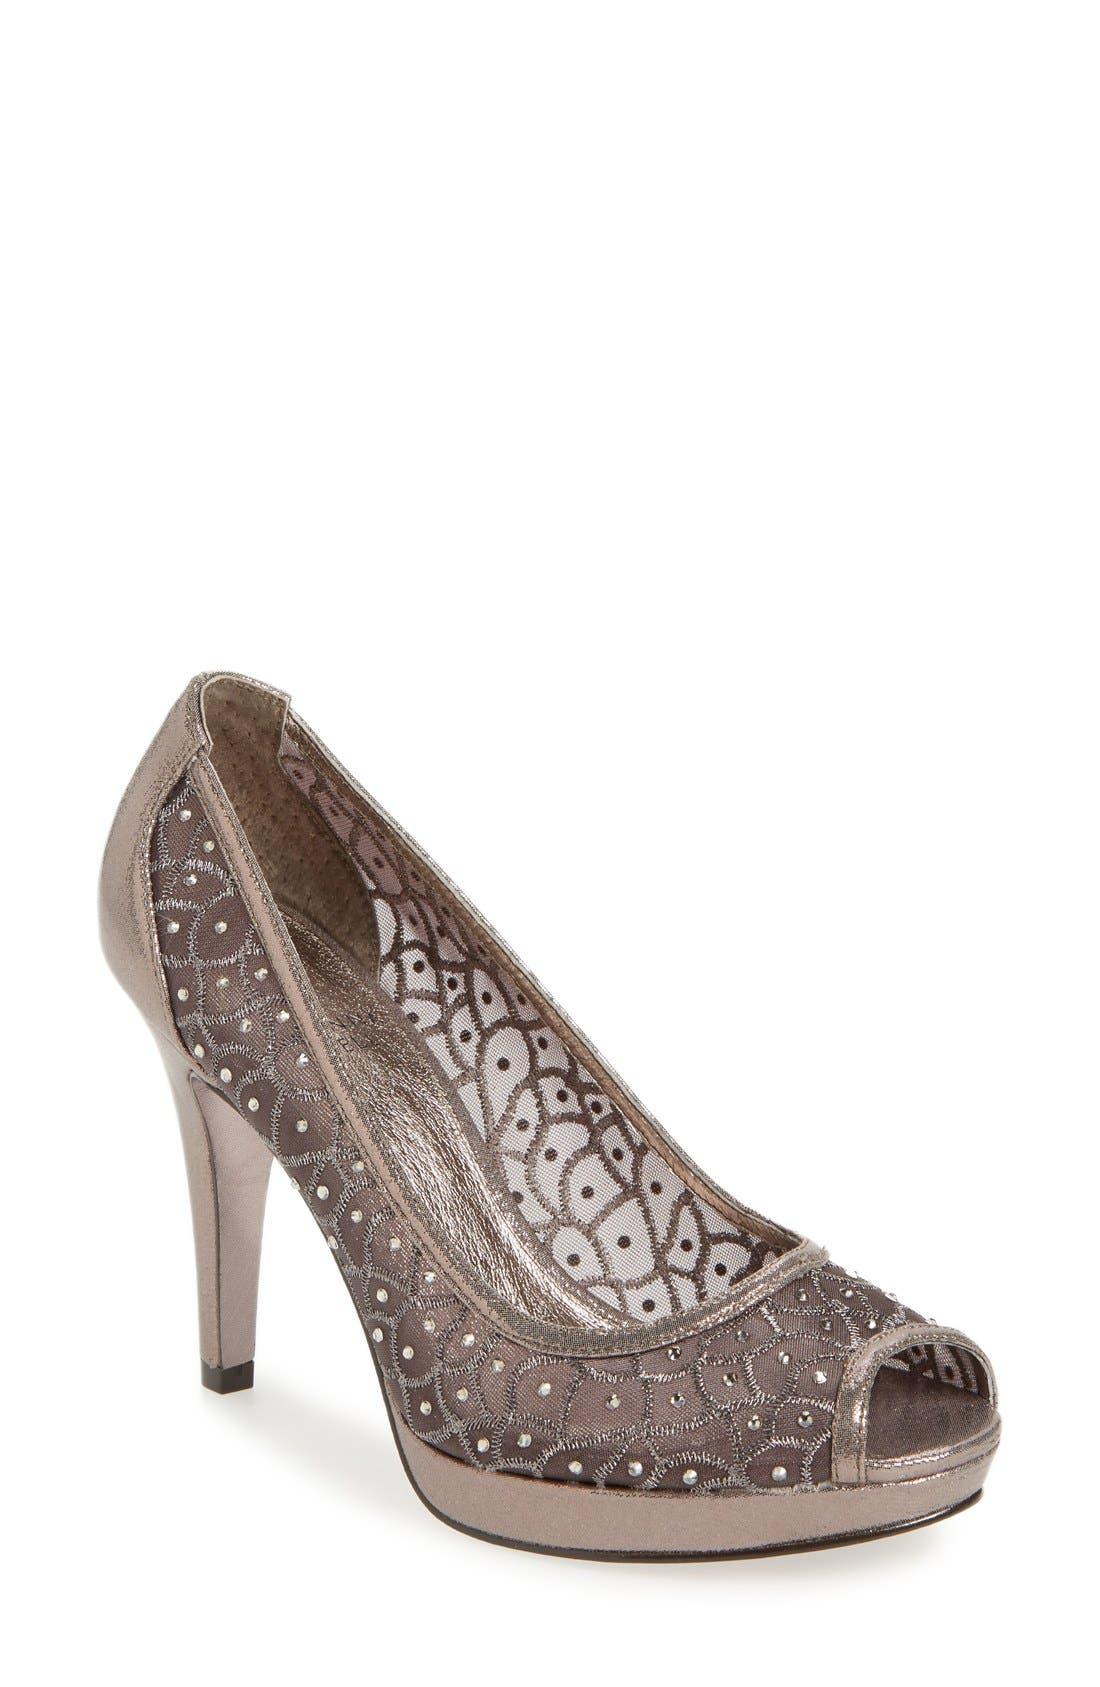 Adrianna Papell 'Foxy' Crystal Embellished Peeptoe Pump (Women)